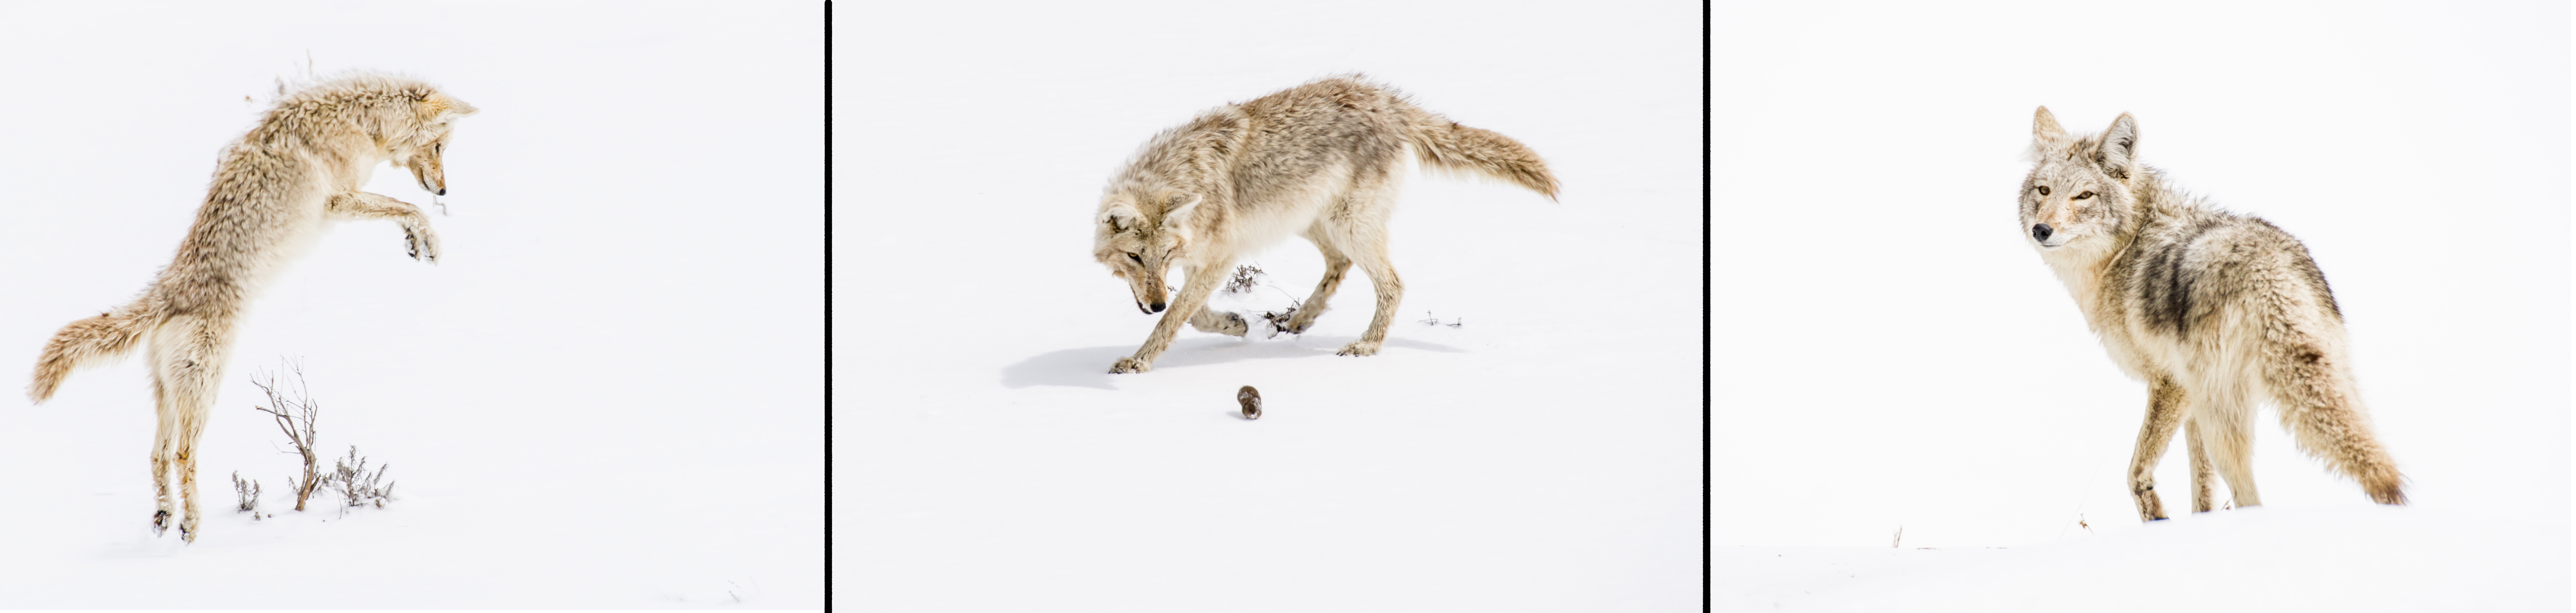 Coyote Dinner Dance